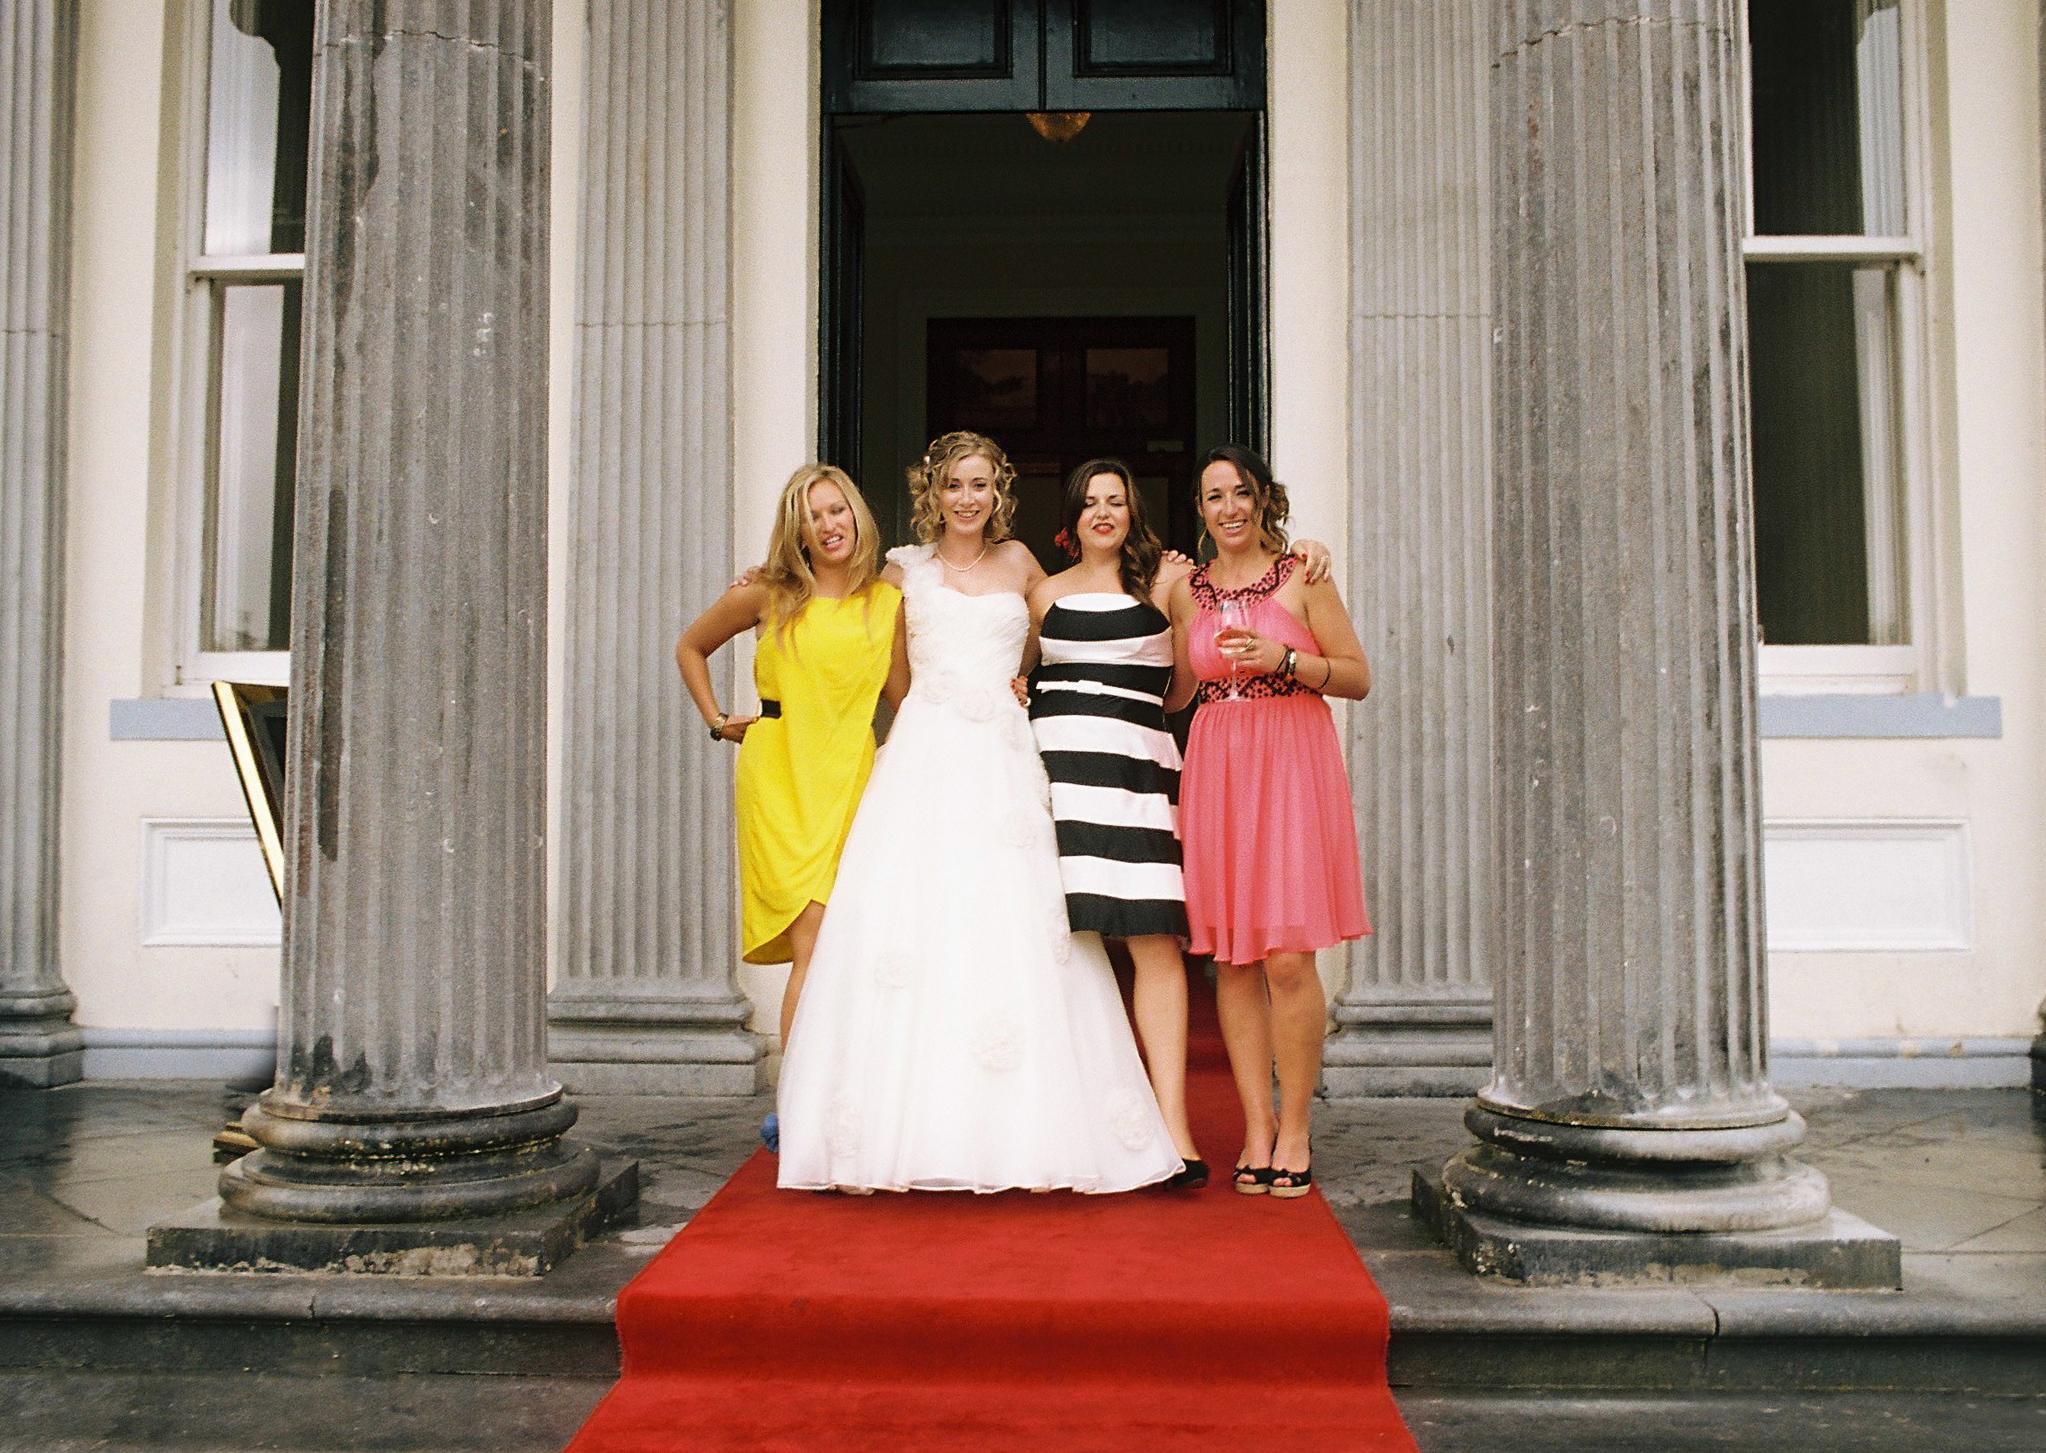 wedding-bridesmaids-pose.jpg